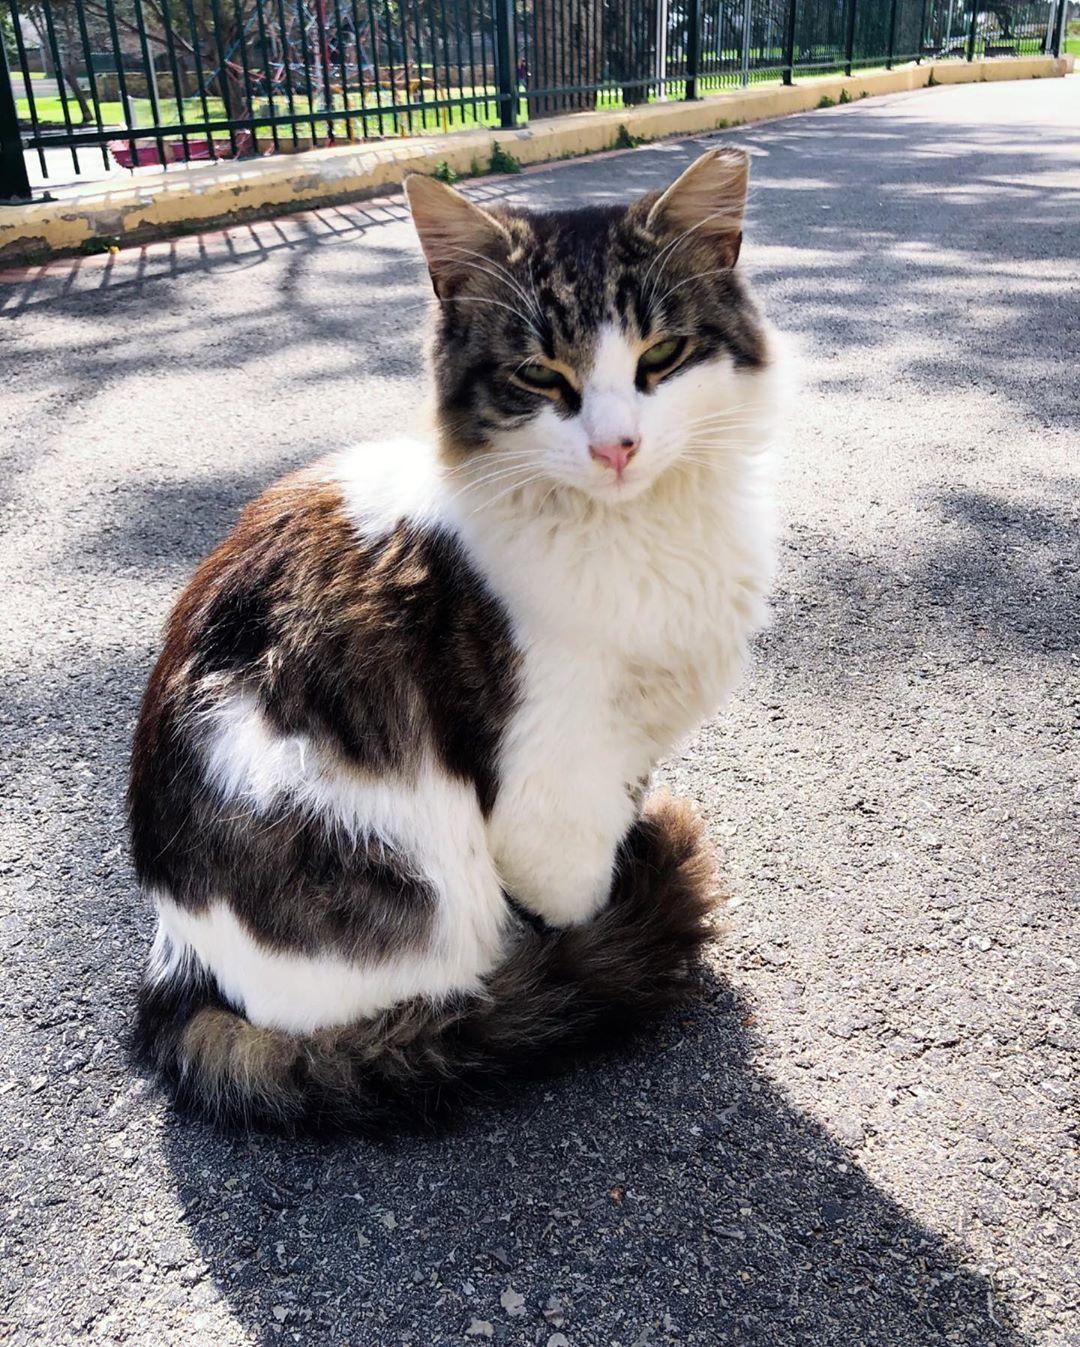 Good morning, beautiful 🌻 . . . . . .  #streetcatsofisrael #streetcat #streetcats #israel #telaviv #battam #jerusalem #haifa #cat #cats #catsofinstagram #cats_of_instagram #catlover #catlovers #catstagram #catoftheday #catsoftheworld #catsoftheday #catsagram #cat_of_instagram #catloversclub #catlife #catslife #catphoto #catwoman #ilovecats #instacat